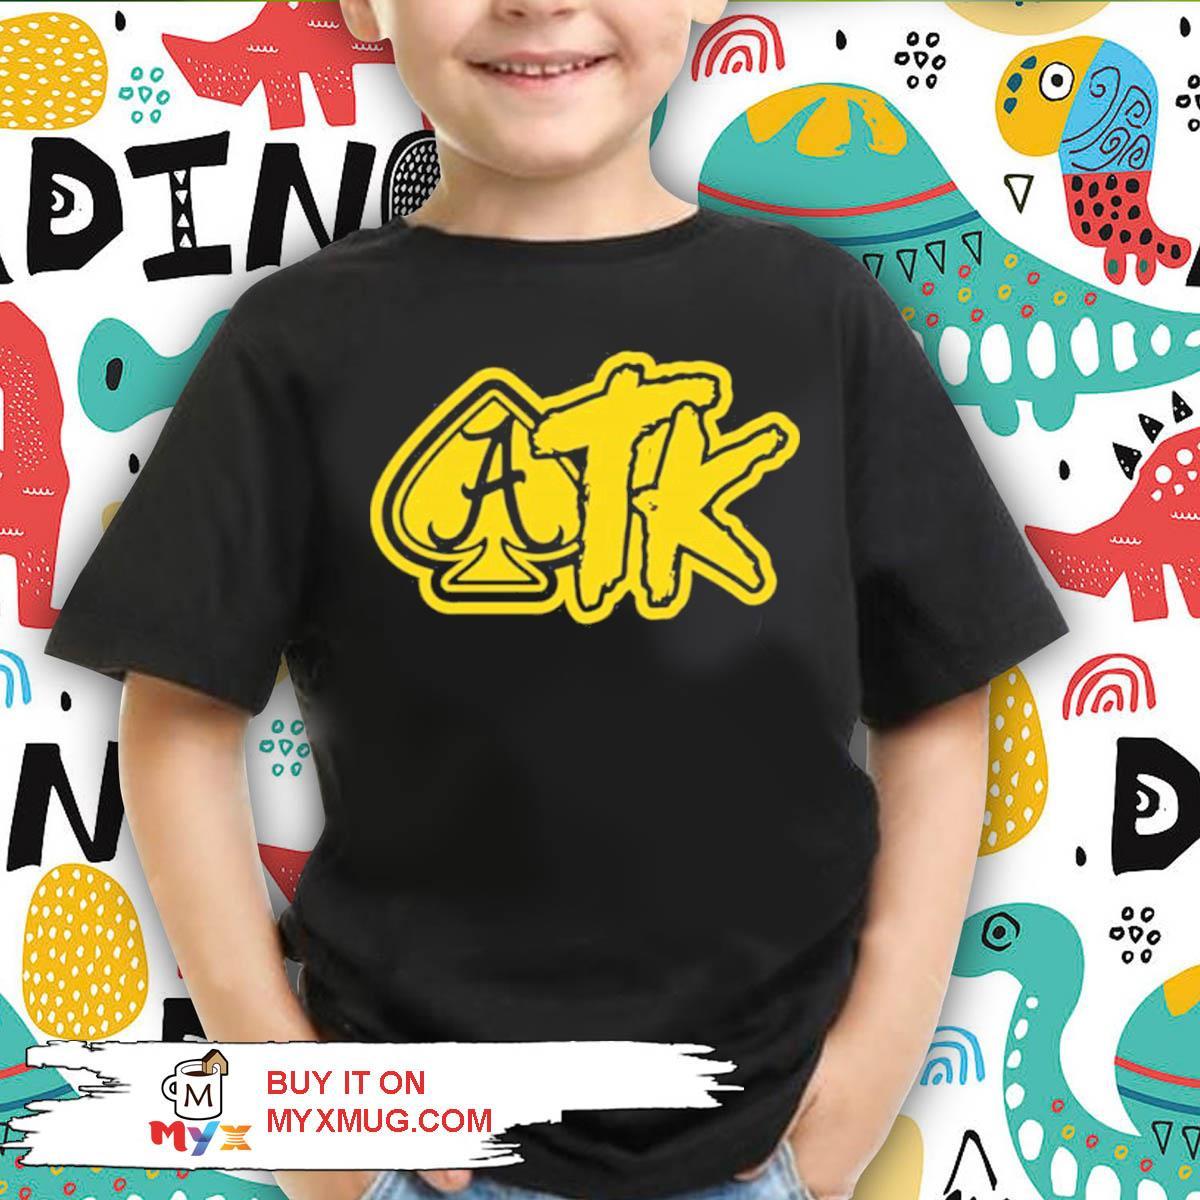 Atk merch spade black s kid shirt